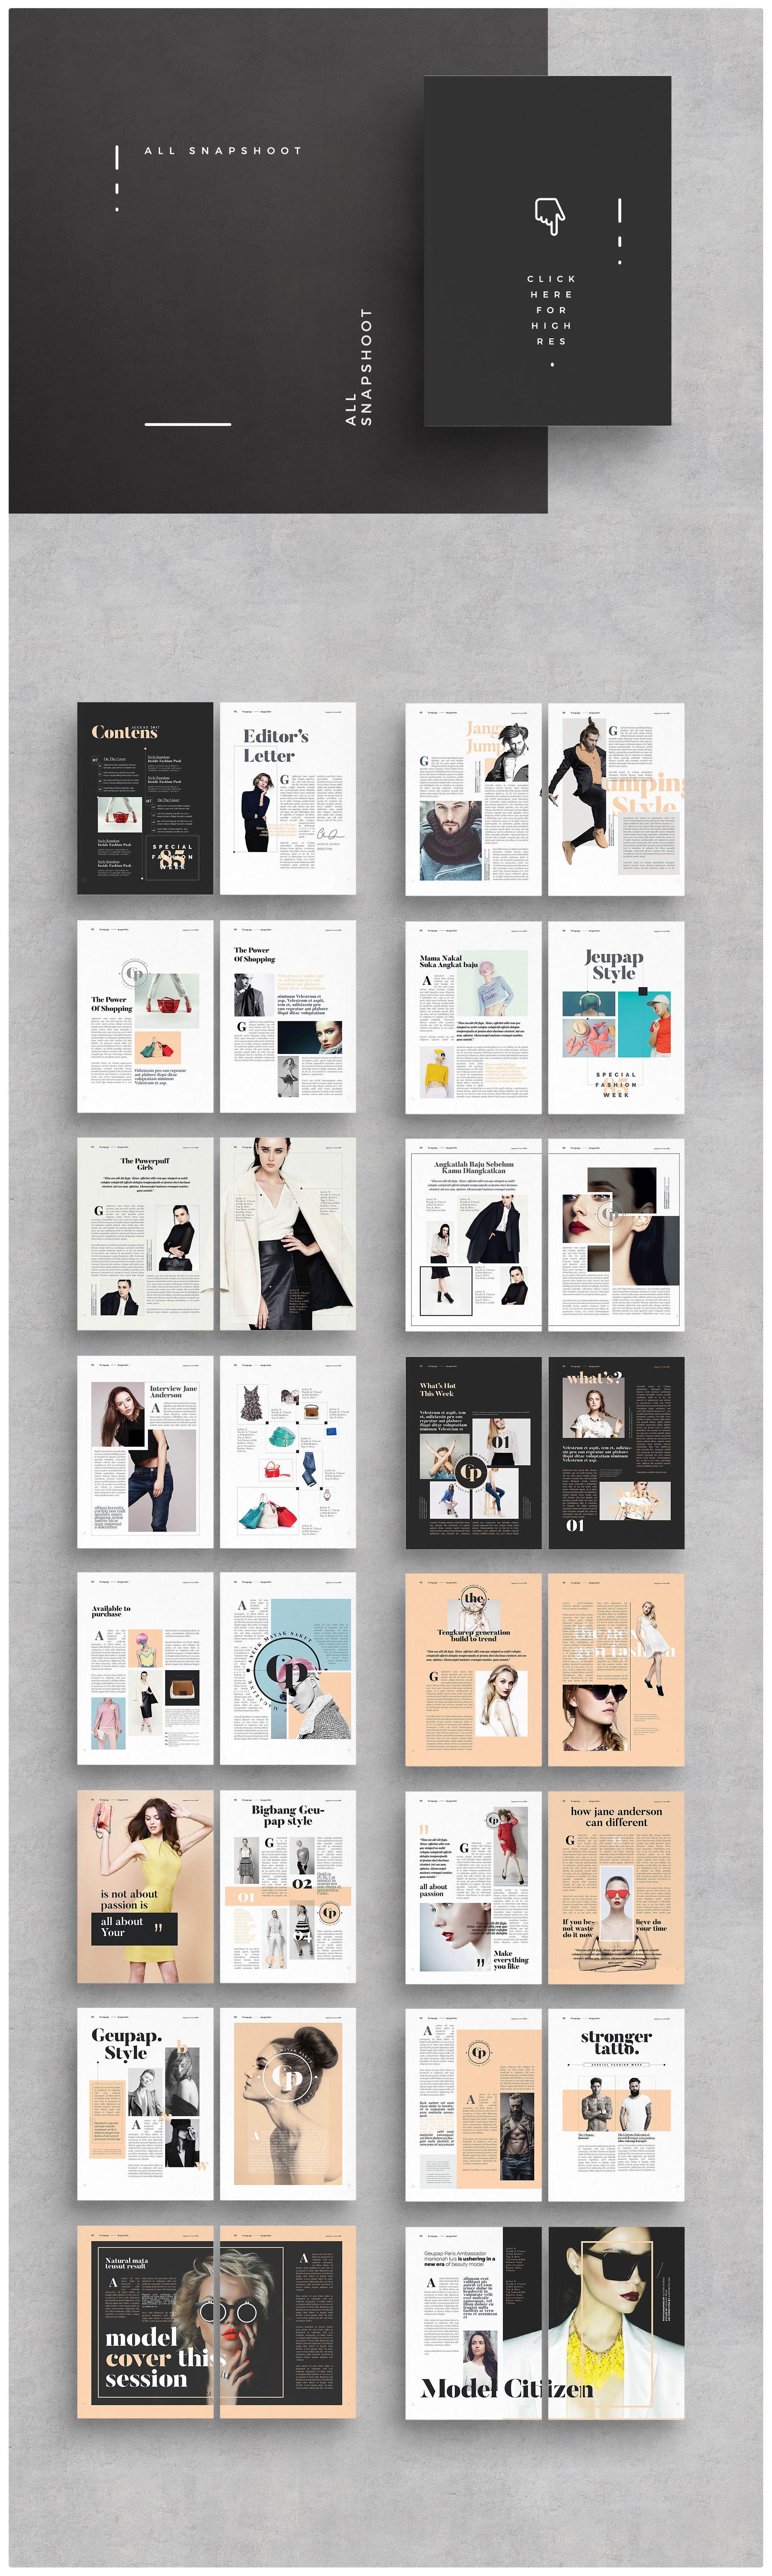 lookbook template brochure folio modern magazine hipster boho photography fashion portfolio. Black Bedroom Furniture Sets. Home Design Ideas